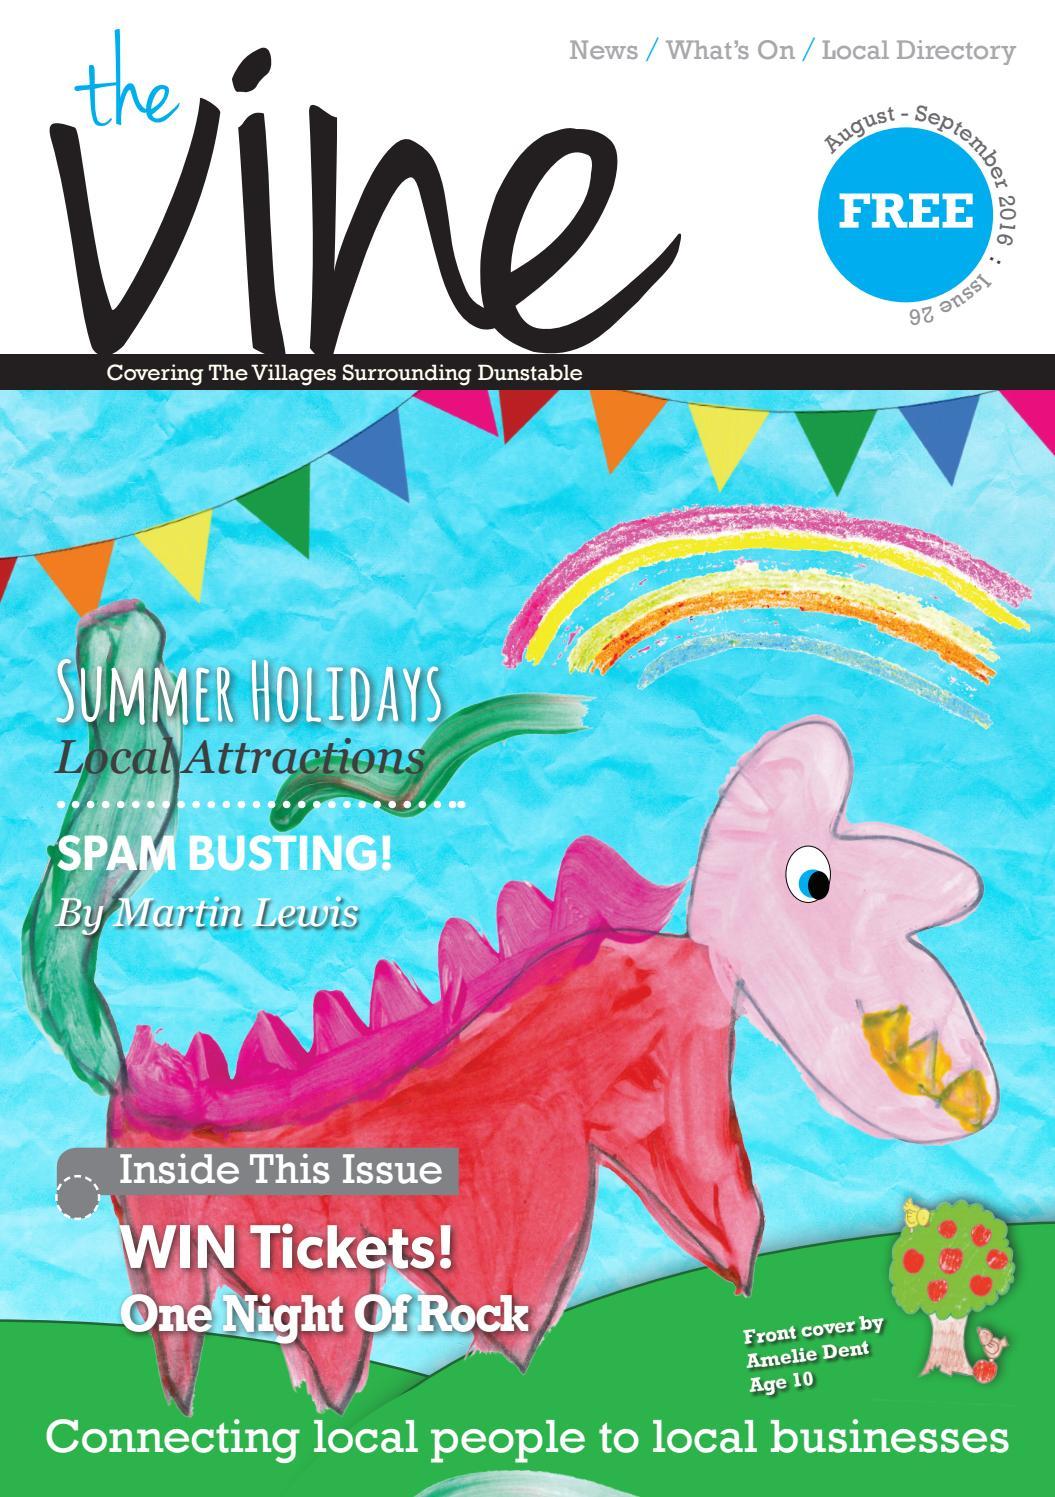 e5e5604e The Vine Villages - August / September 2016 - Issue 26 by The Vine ...